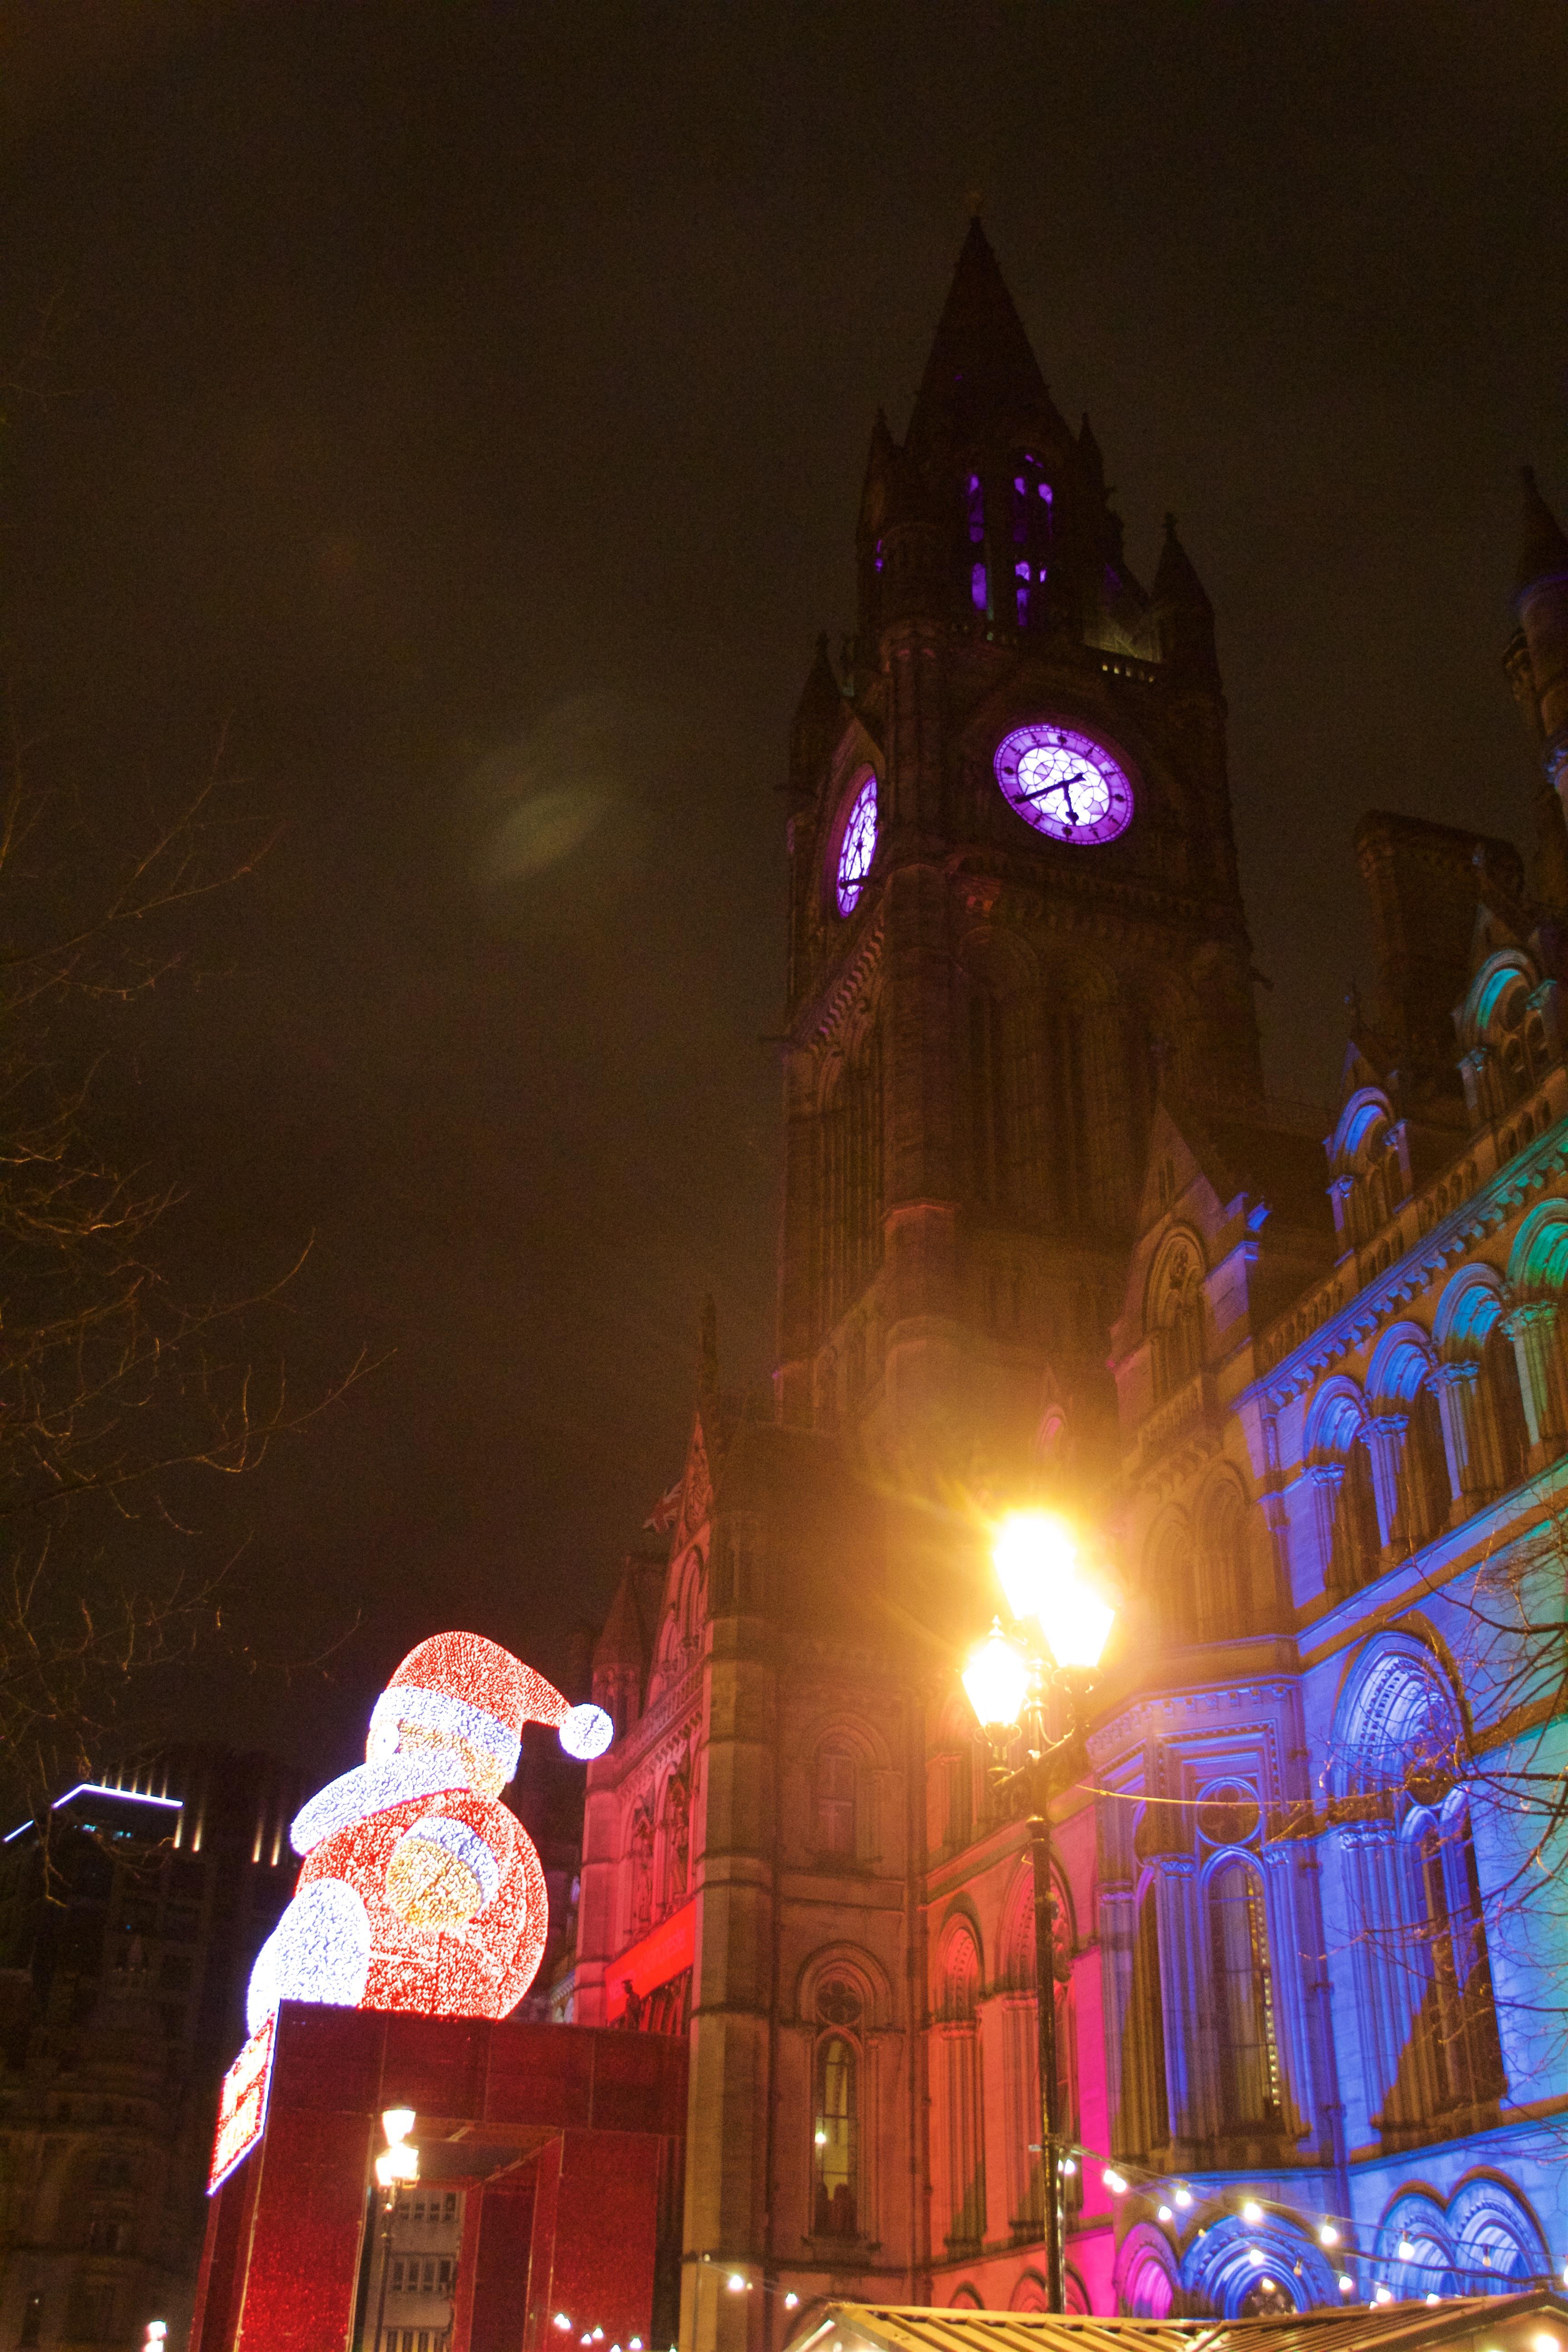 File:Manchester Christmas Markets 2015 014 jpg - Wikimedia